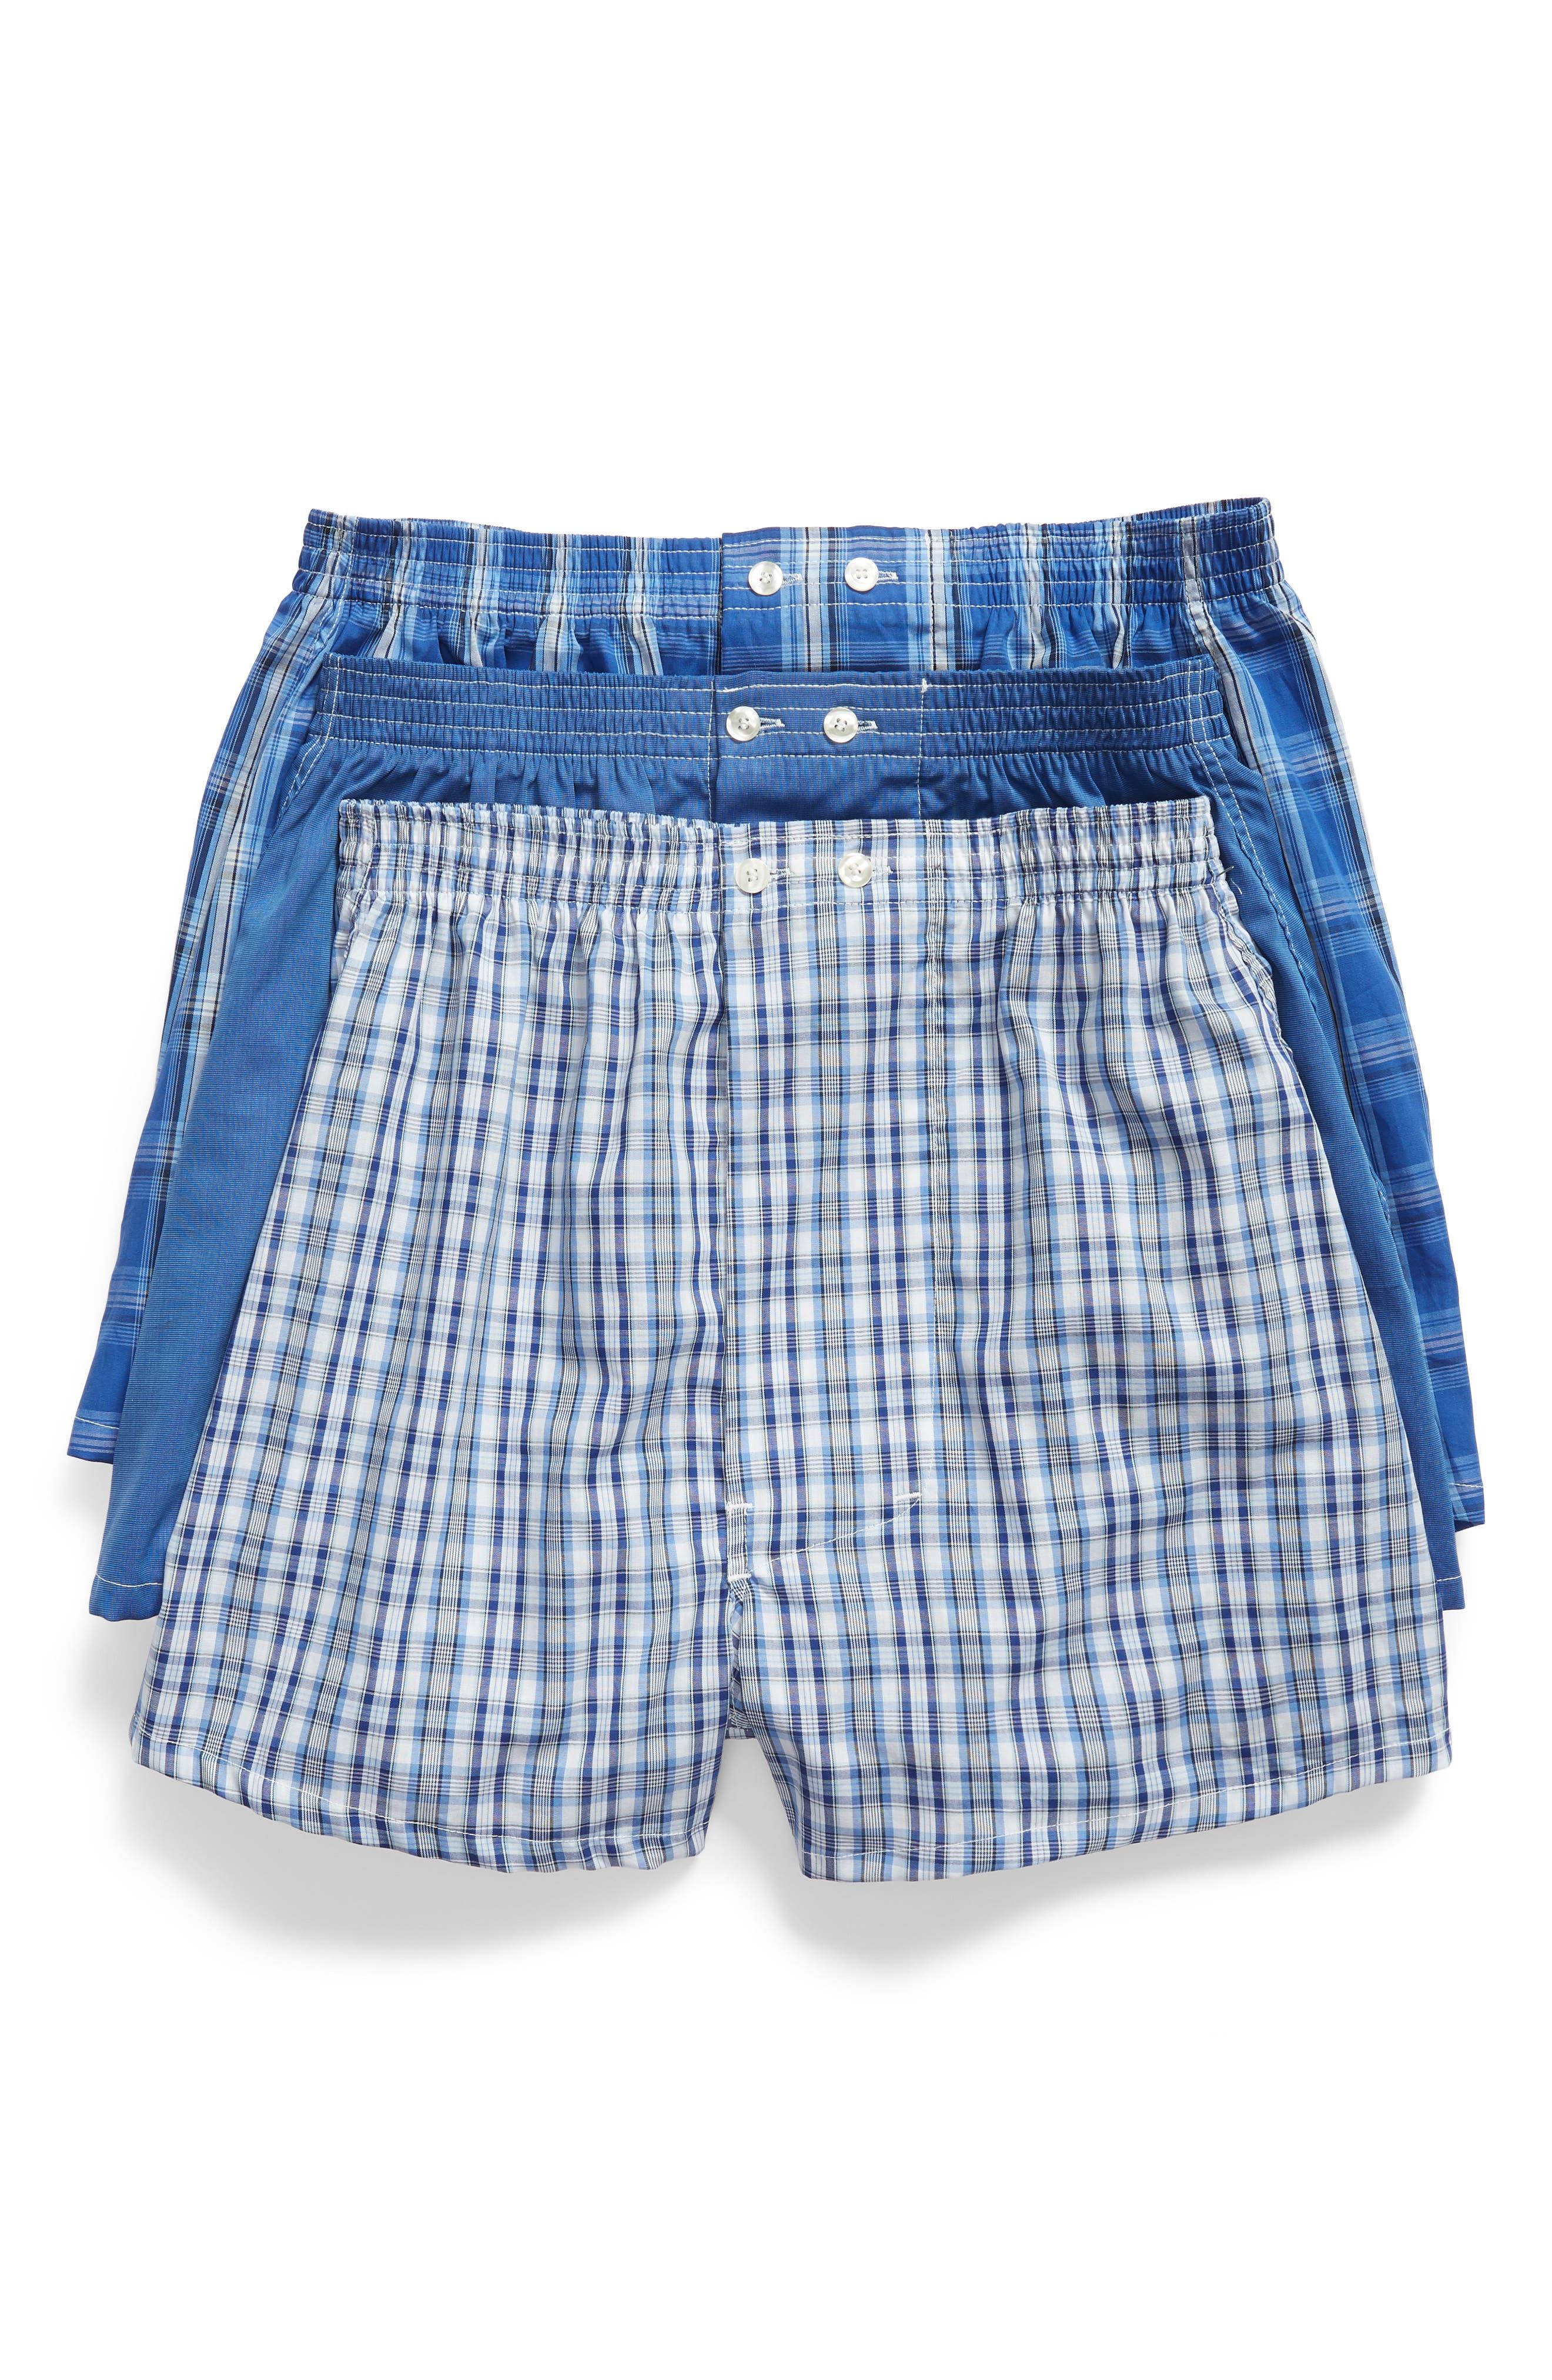 3-Pack Classic Fit Boxers,                             Main thumbnail 1, color,                             BLUE DAZZLE SOLID- PLAID PACK